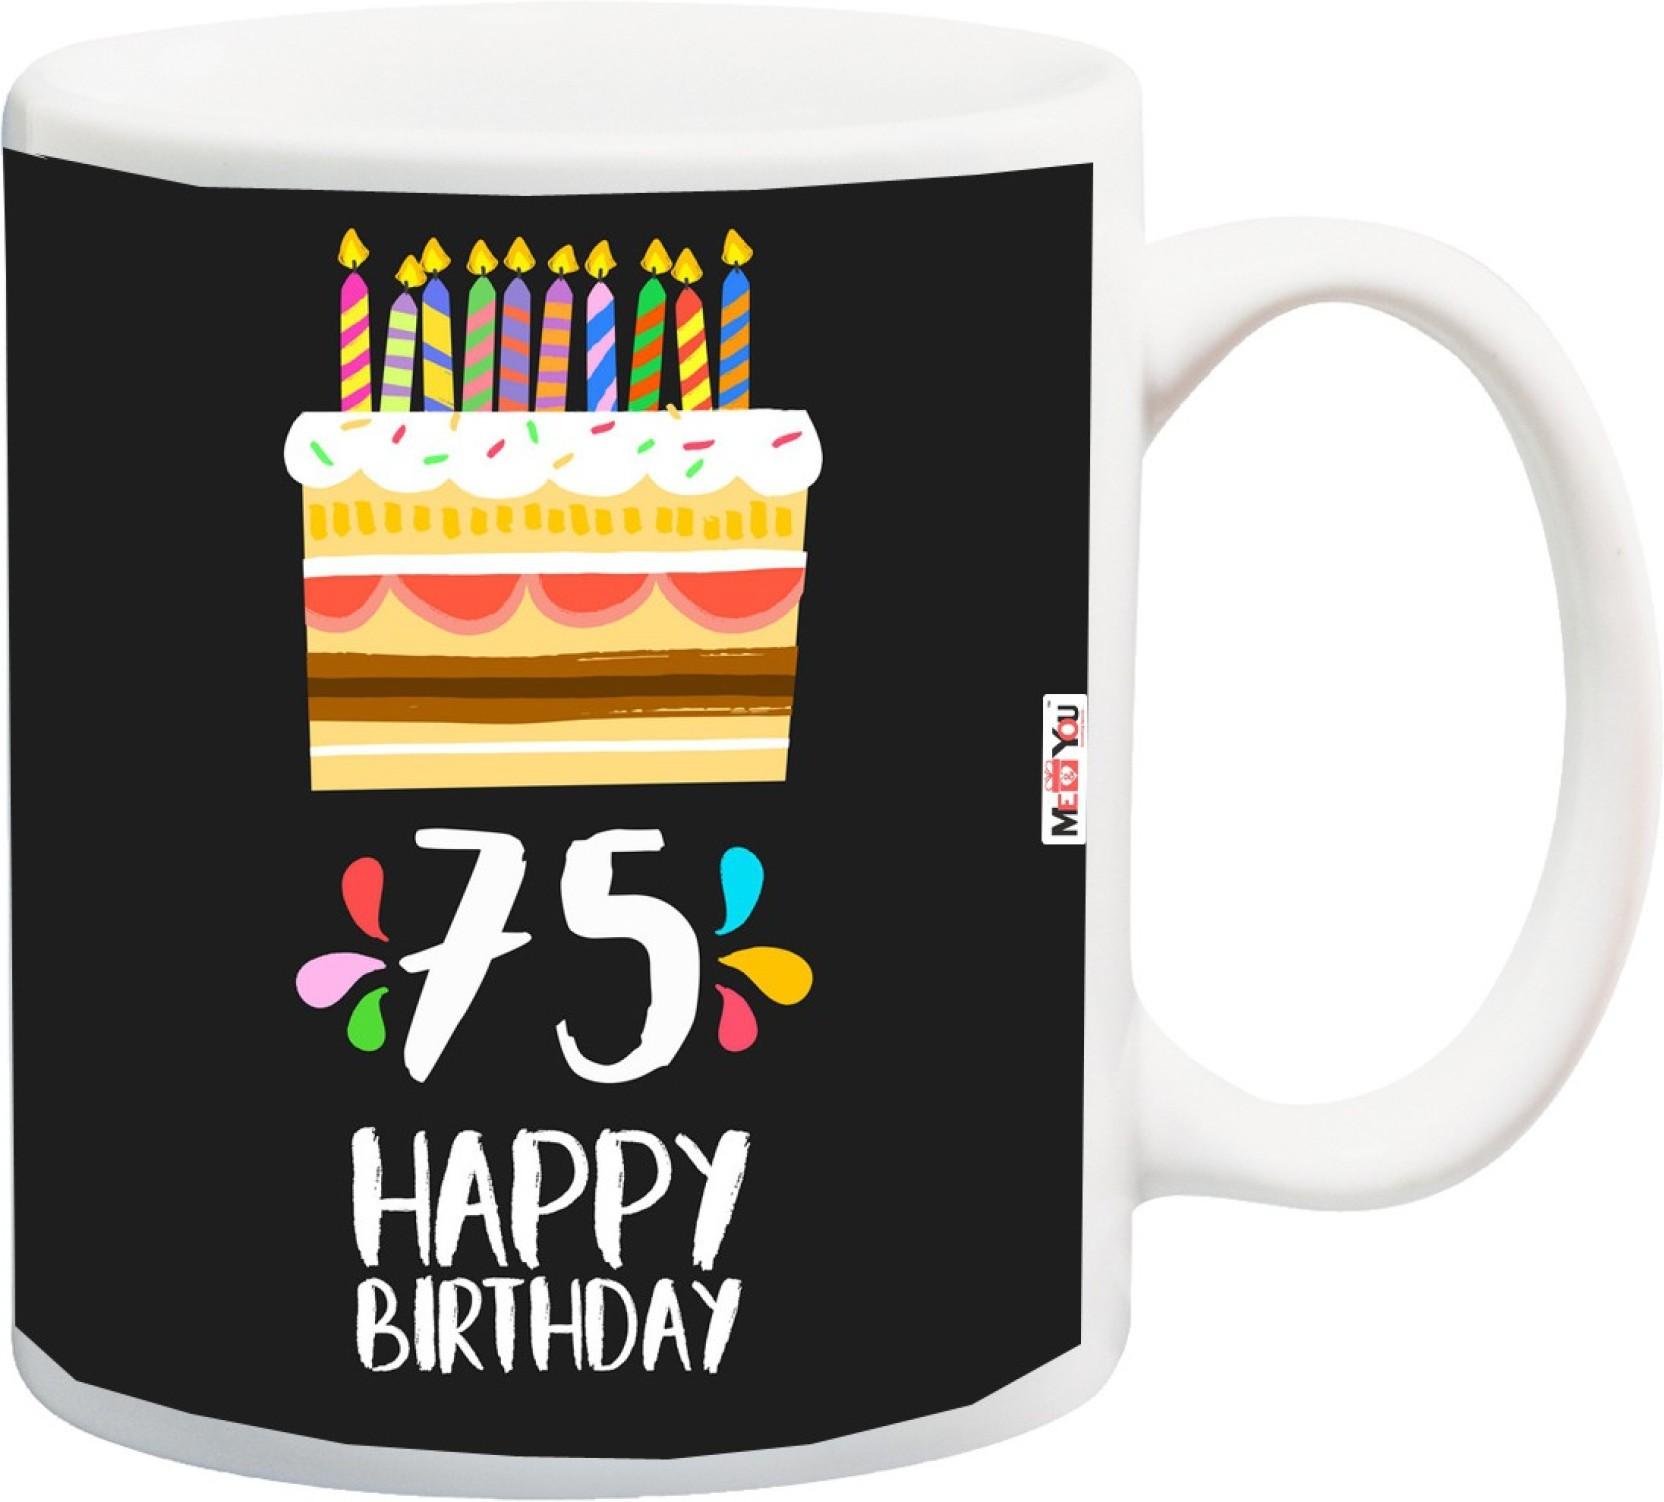 MEYOU Gift For 75th Birthday Unique Grandfather Grandmother Father Mother Brother Sister IZ18SRMU 1362 Ceramic Mug 325 Ml